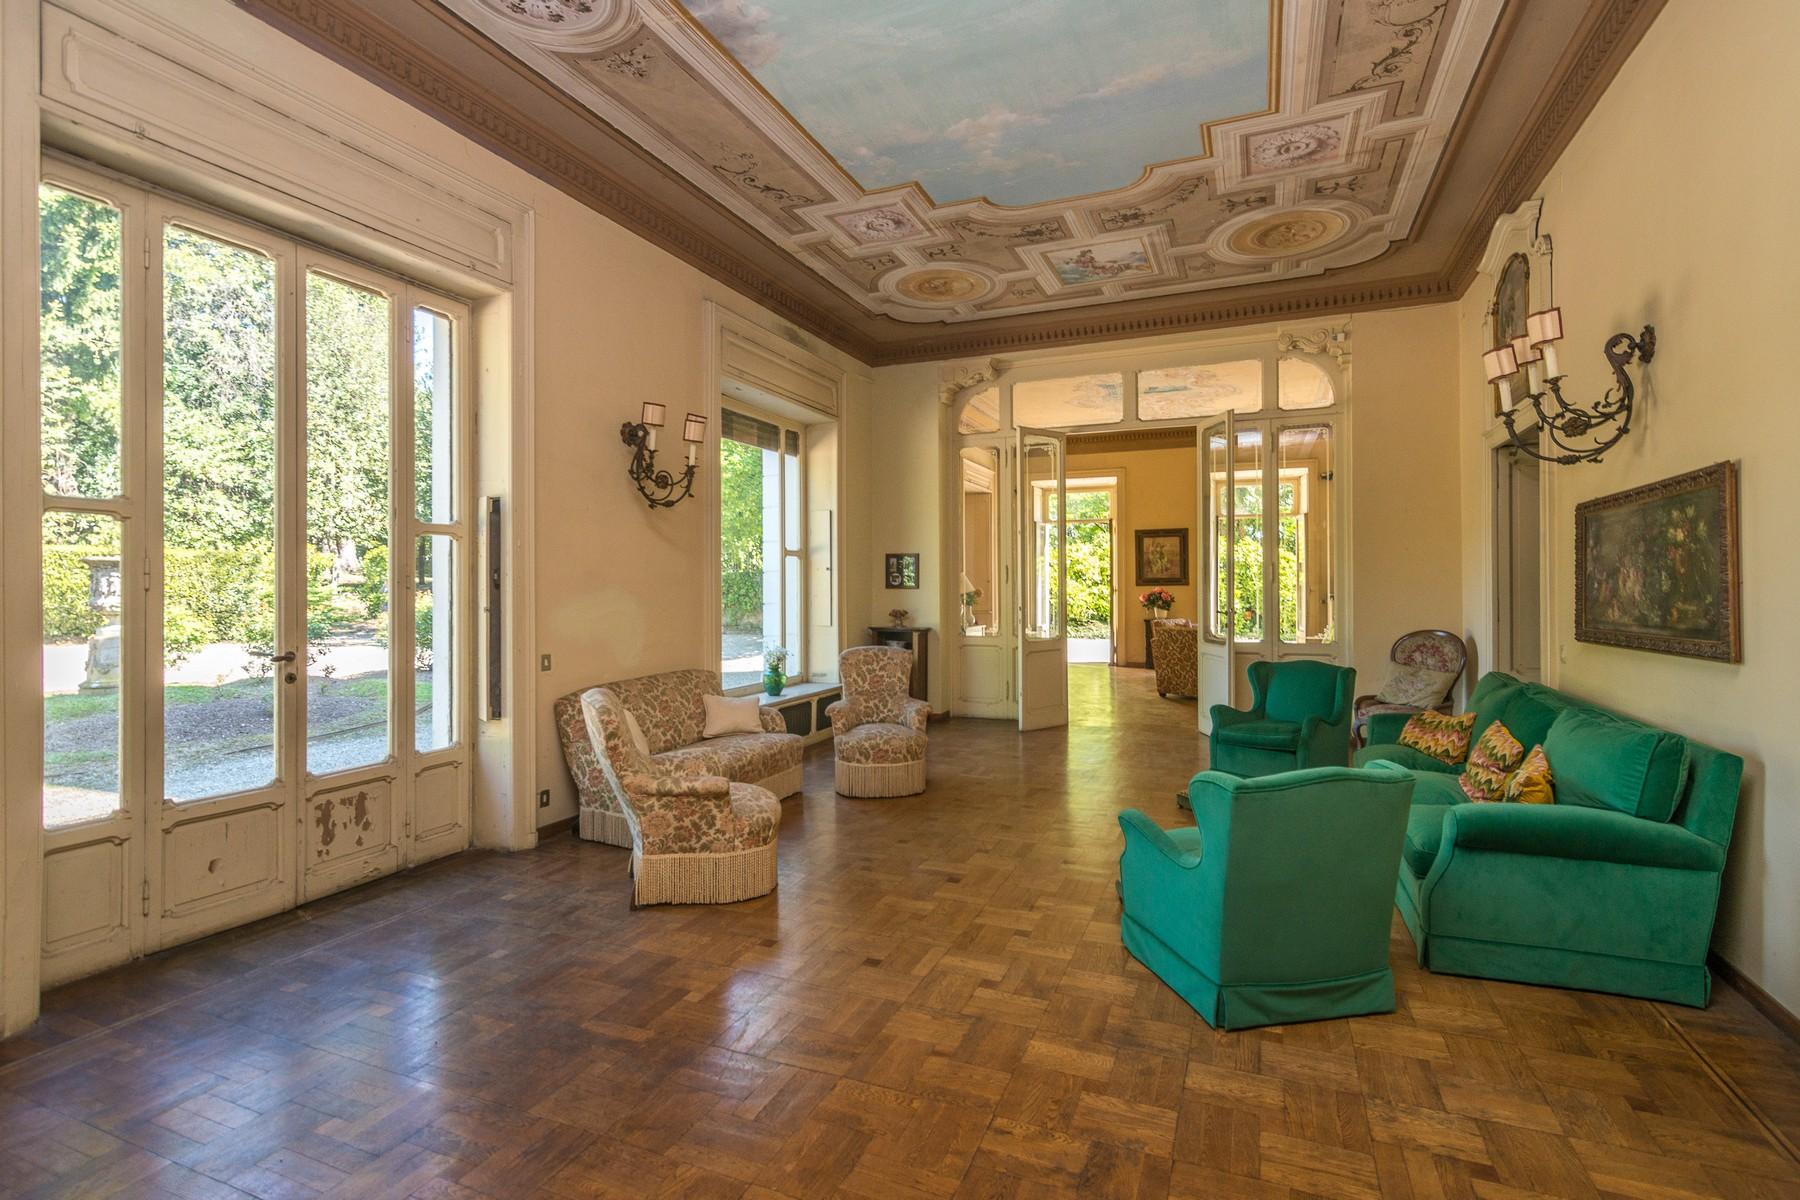 Villa in Vendita a Varese: 5 locali, 1500 mq - Foto 15